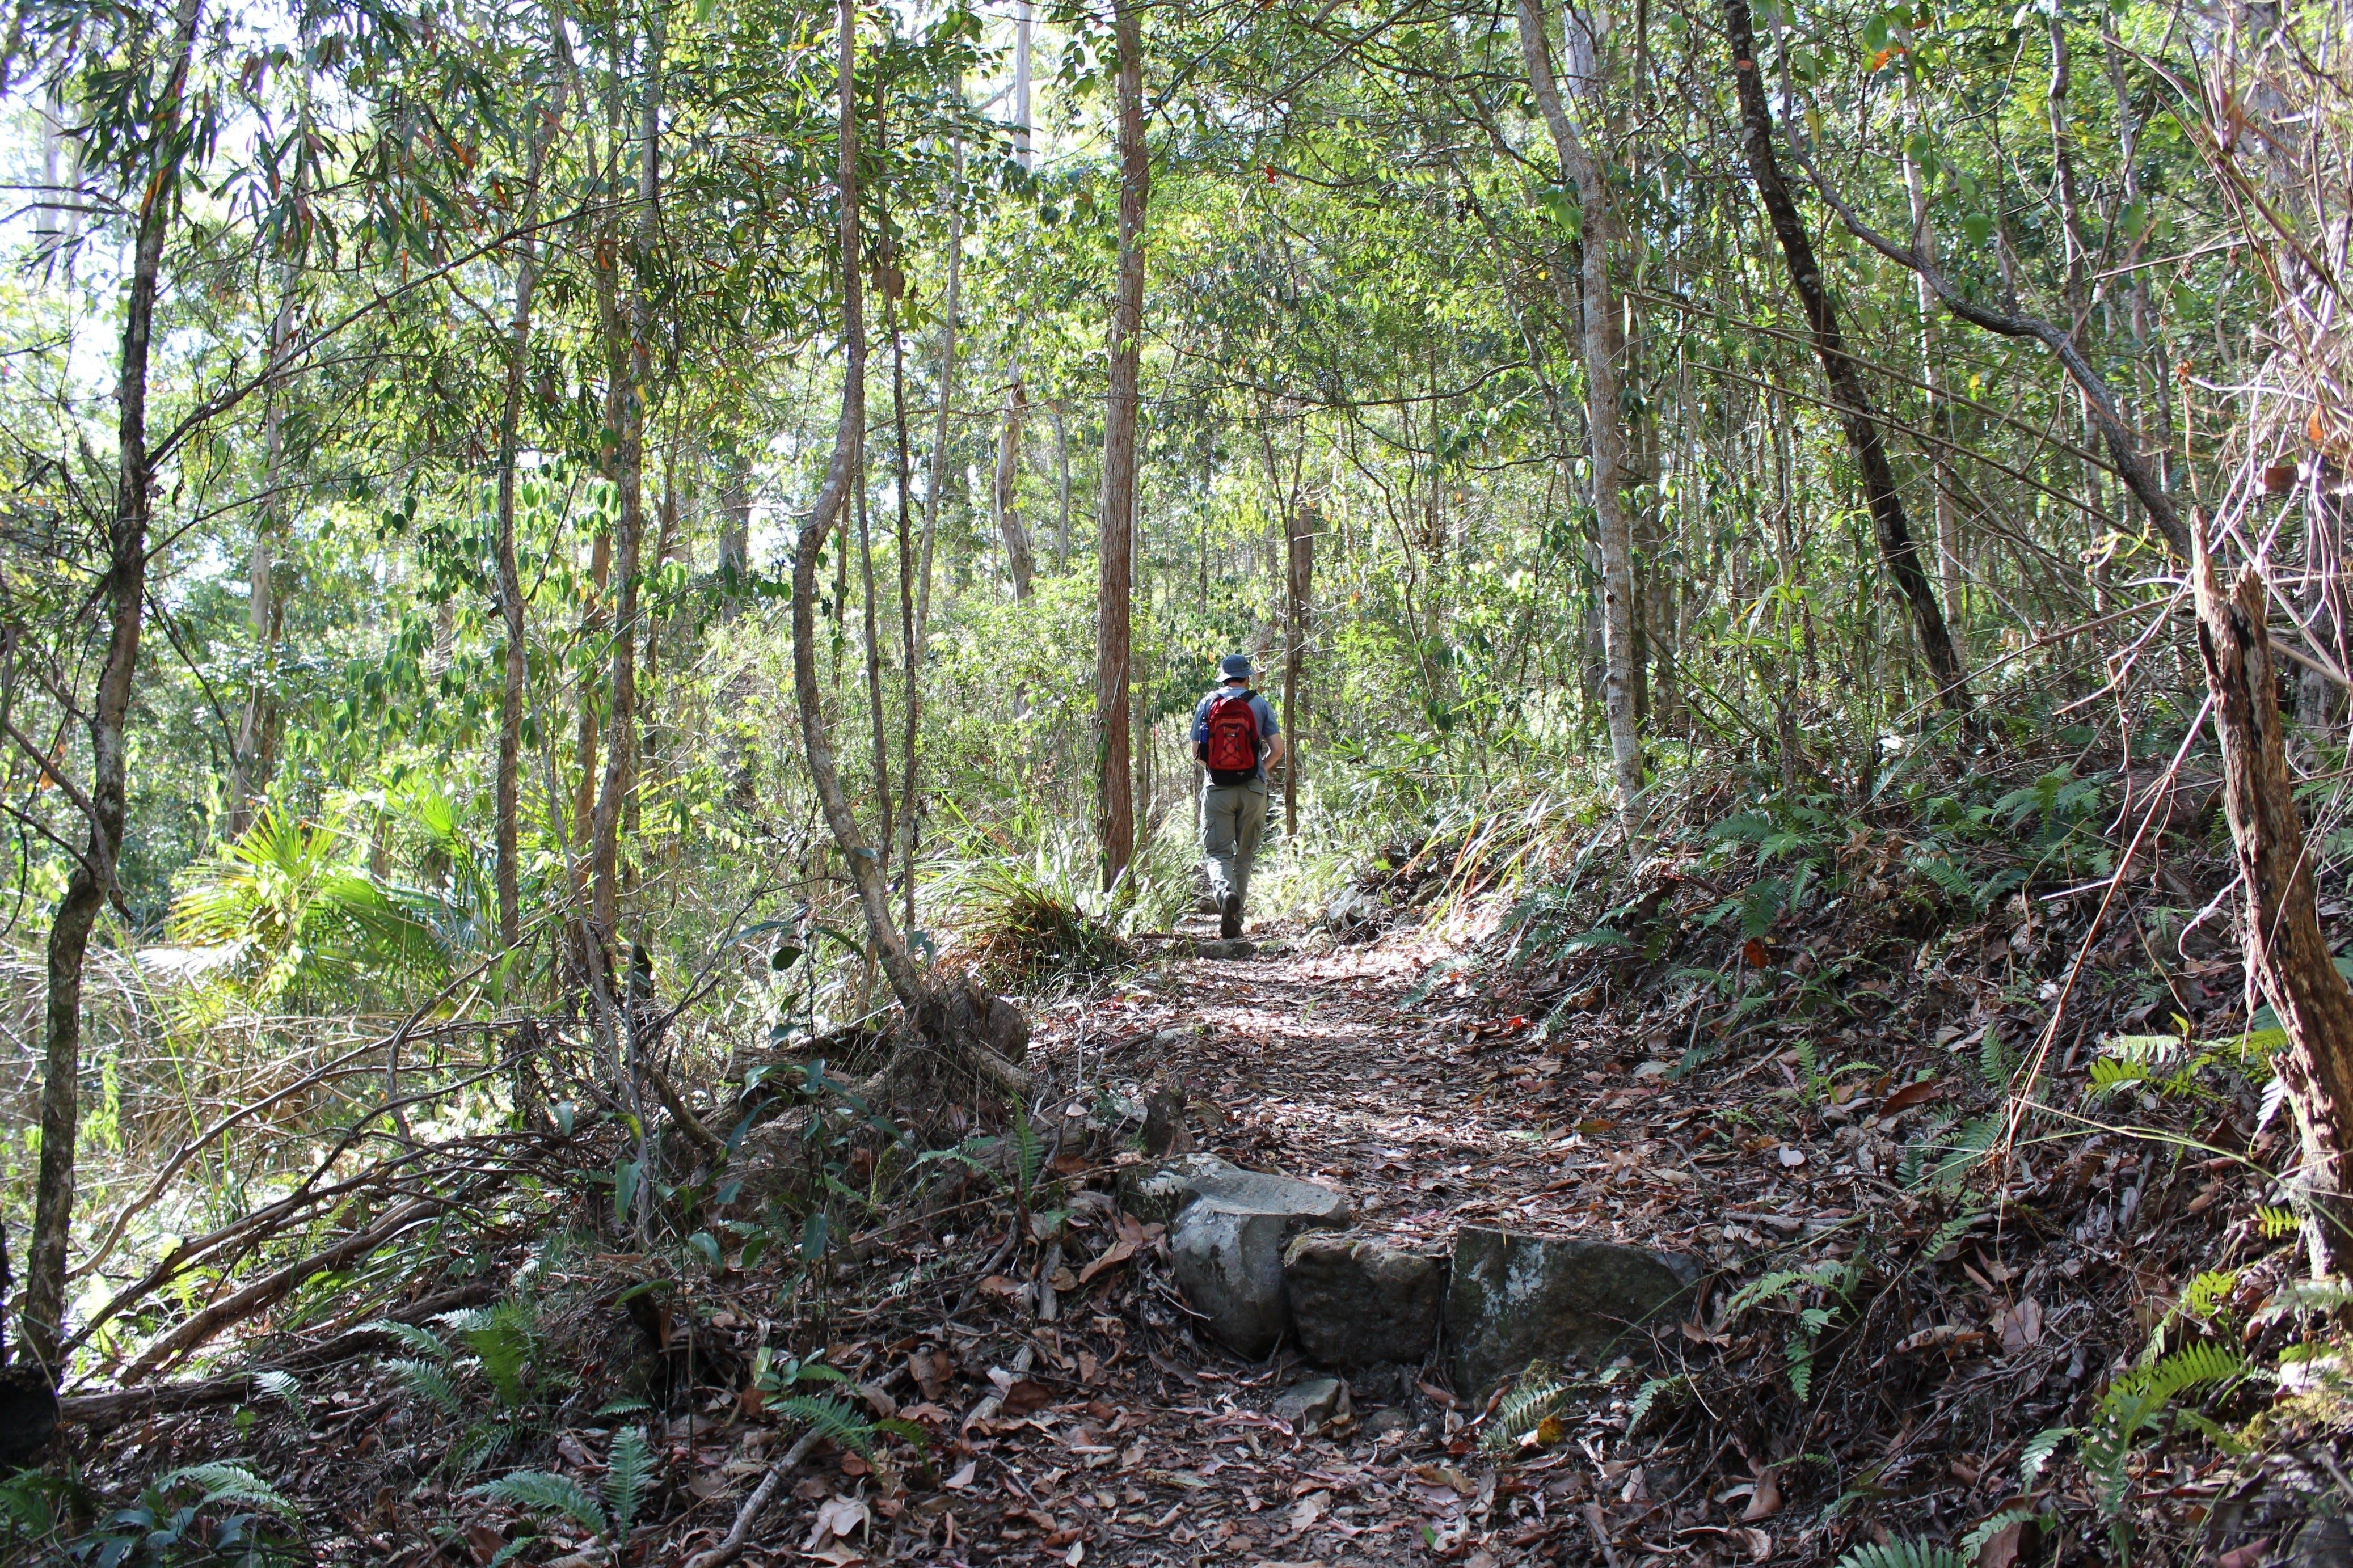 Morelia walking track, D'Aguilar National Park Logo and Images